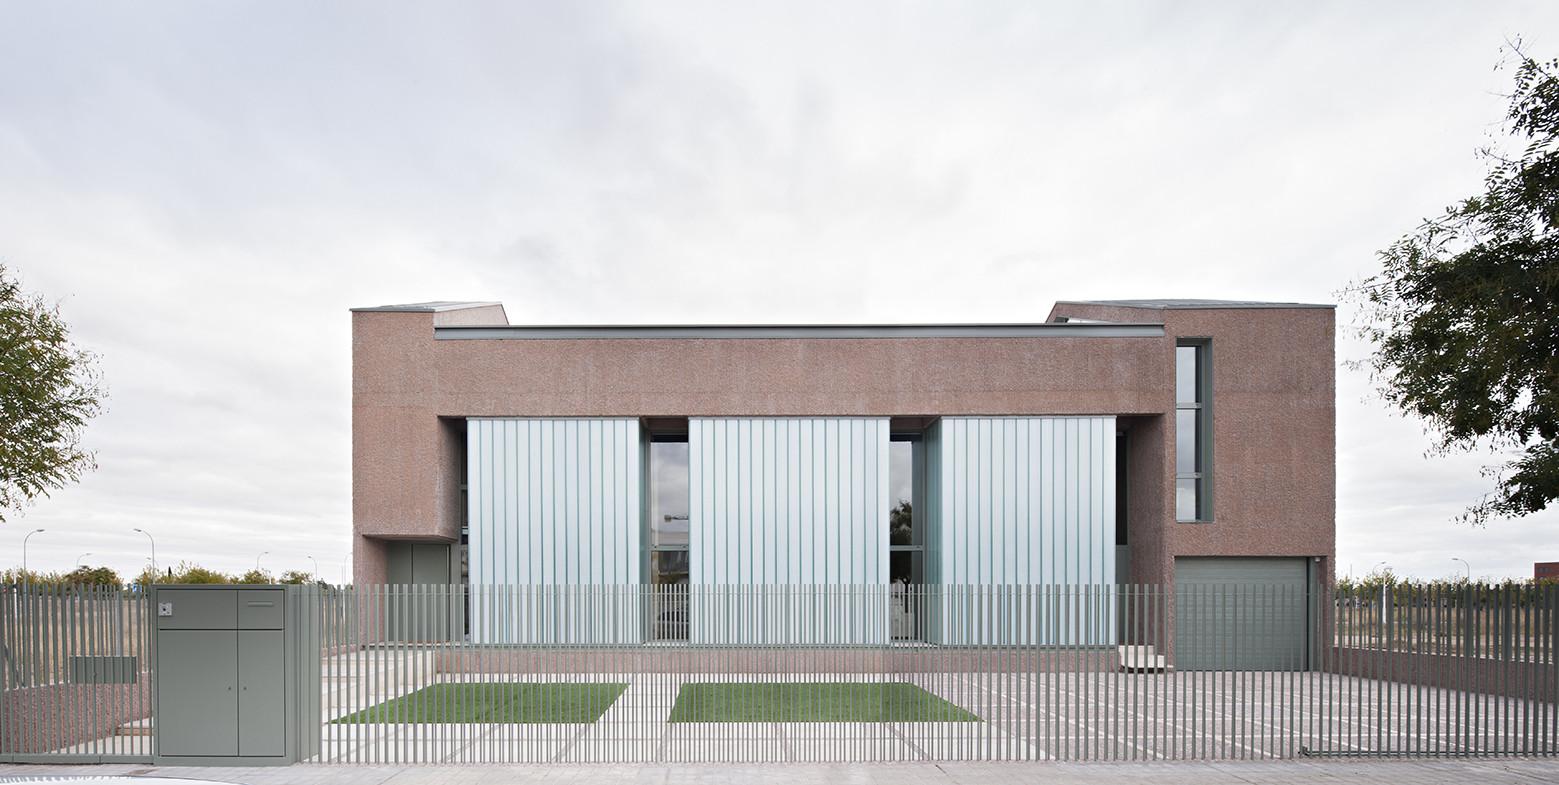 Vivienda entre Medianeras - Casa Fuensanta / MUKA Arquitectura, © Javier Callejas